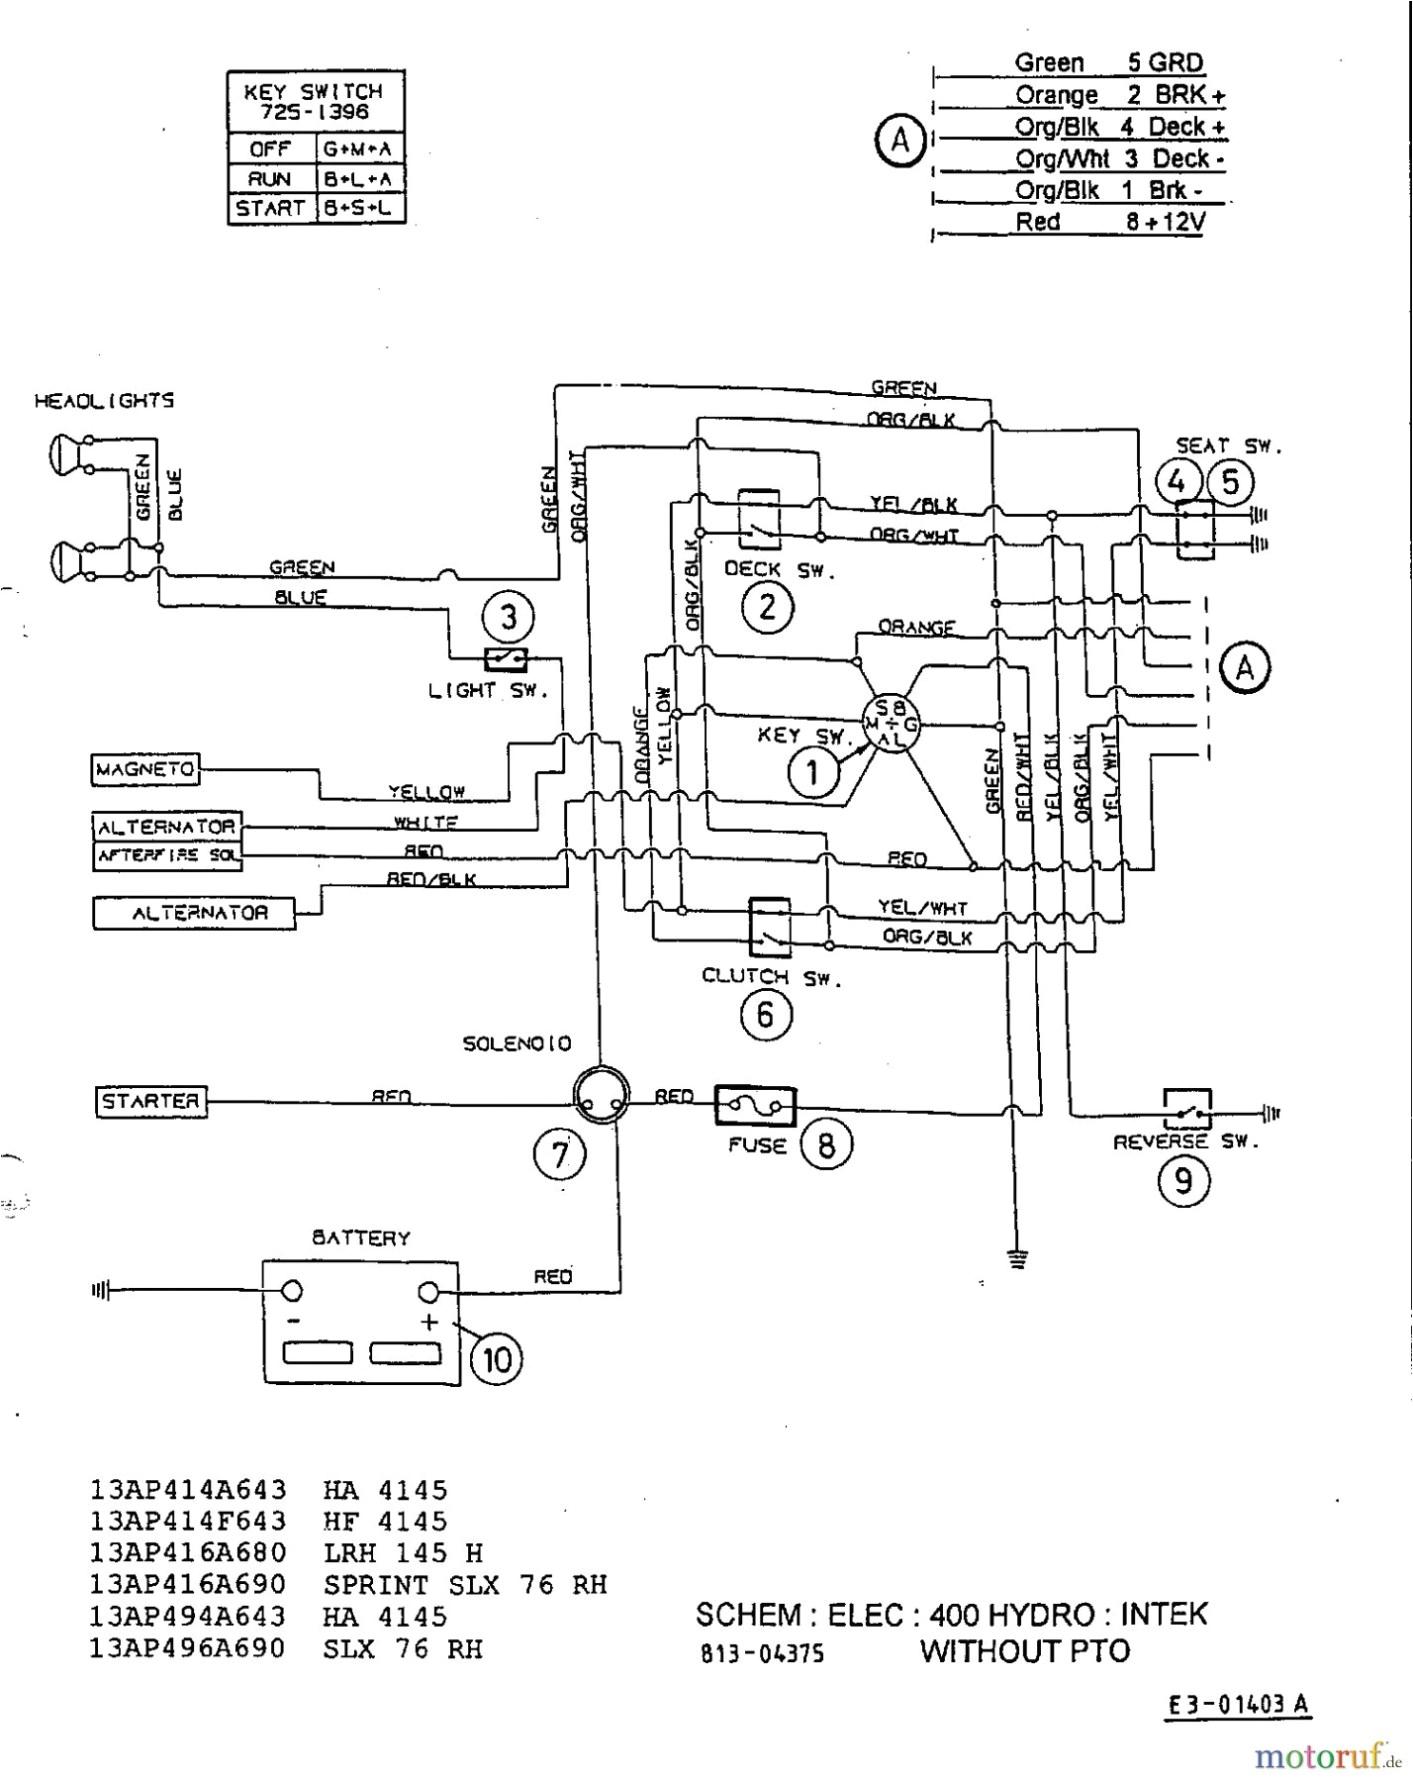 Riding Lawn Mower Wiring Diagram Agway Wiring Diagram Wiring Diagram Preview